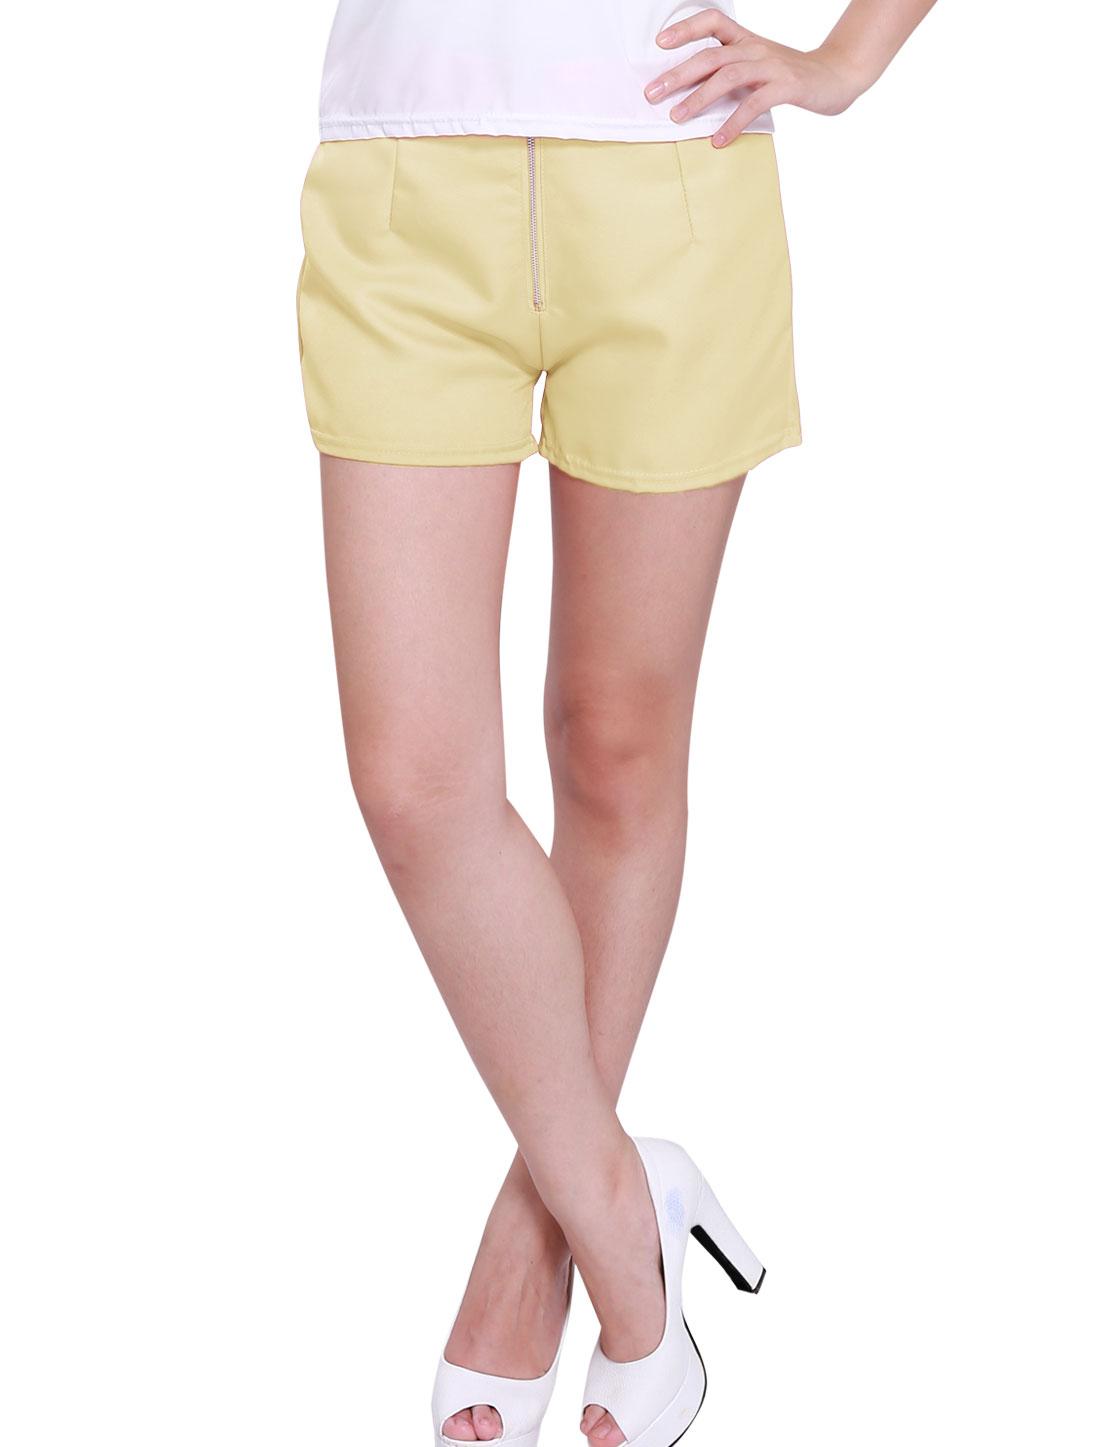 Women Zipper Fly Front Elastic Waist Elegant Shorts Beige S